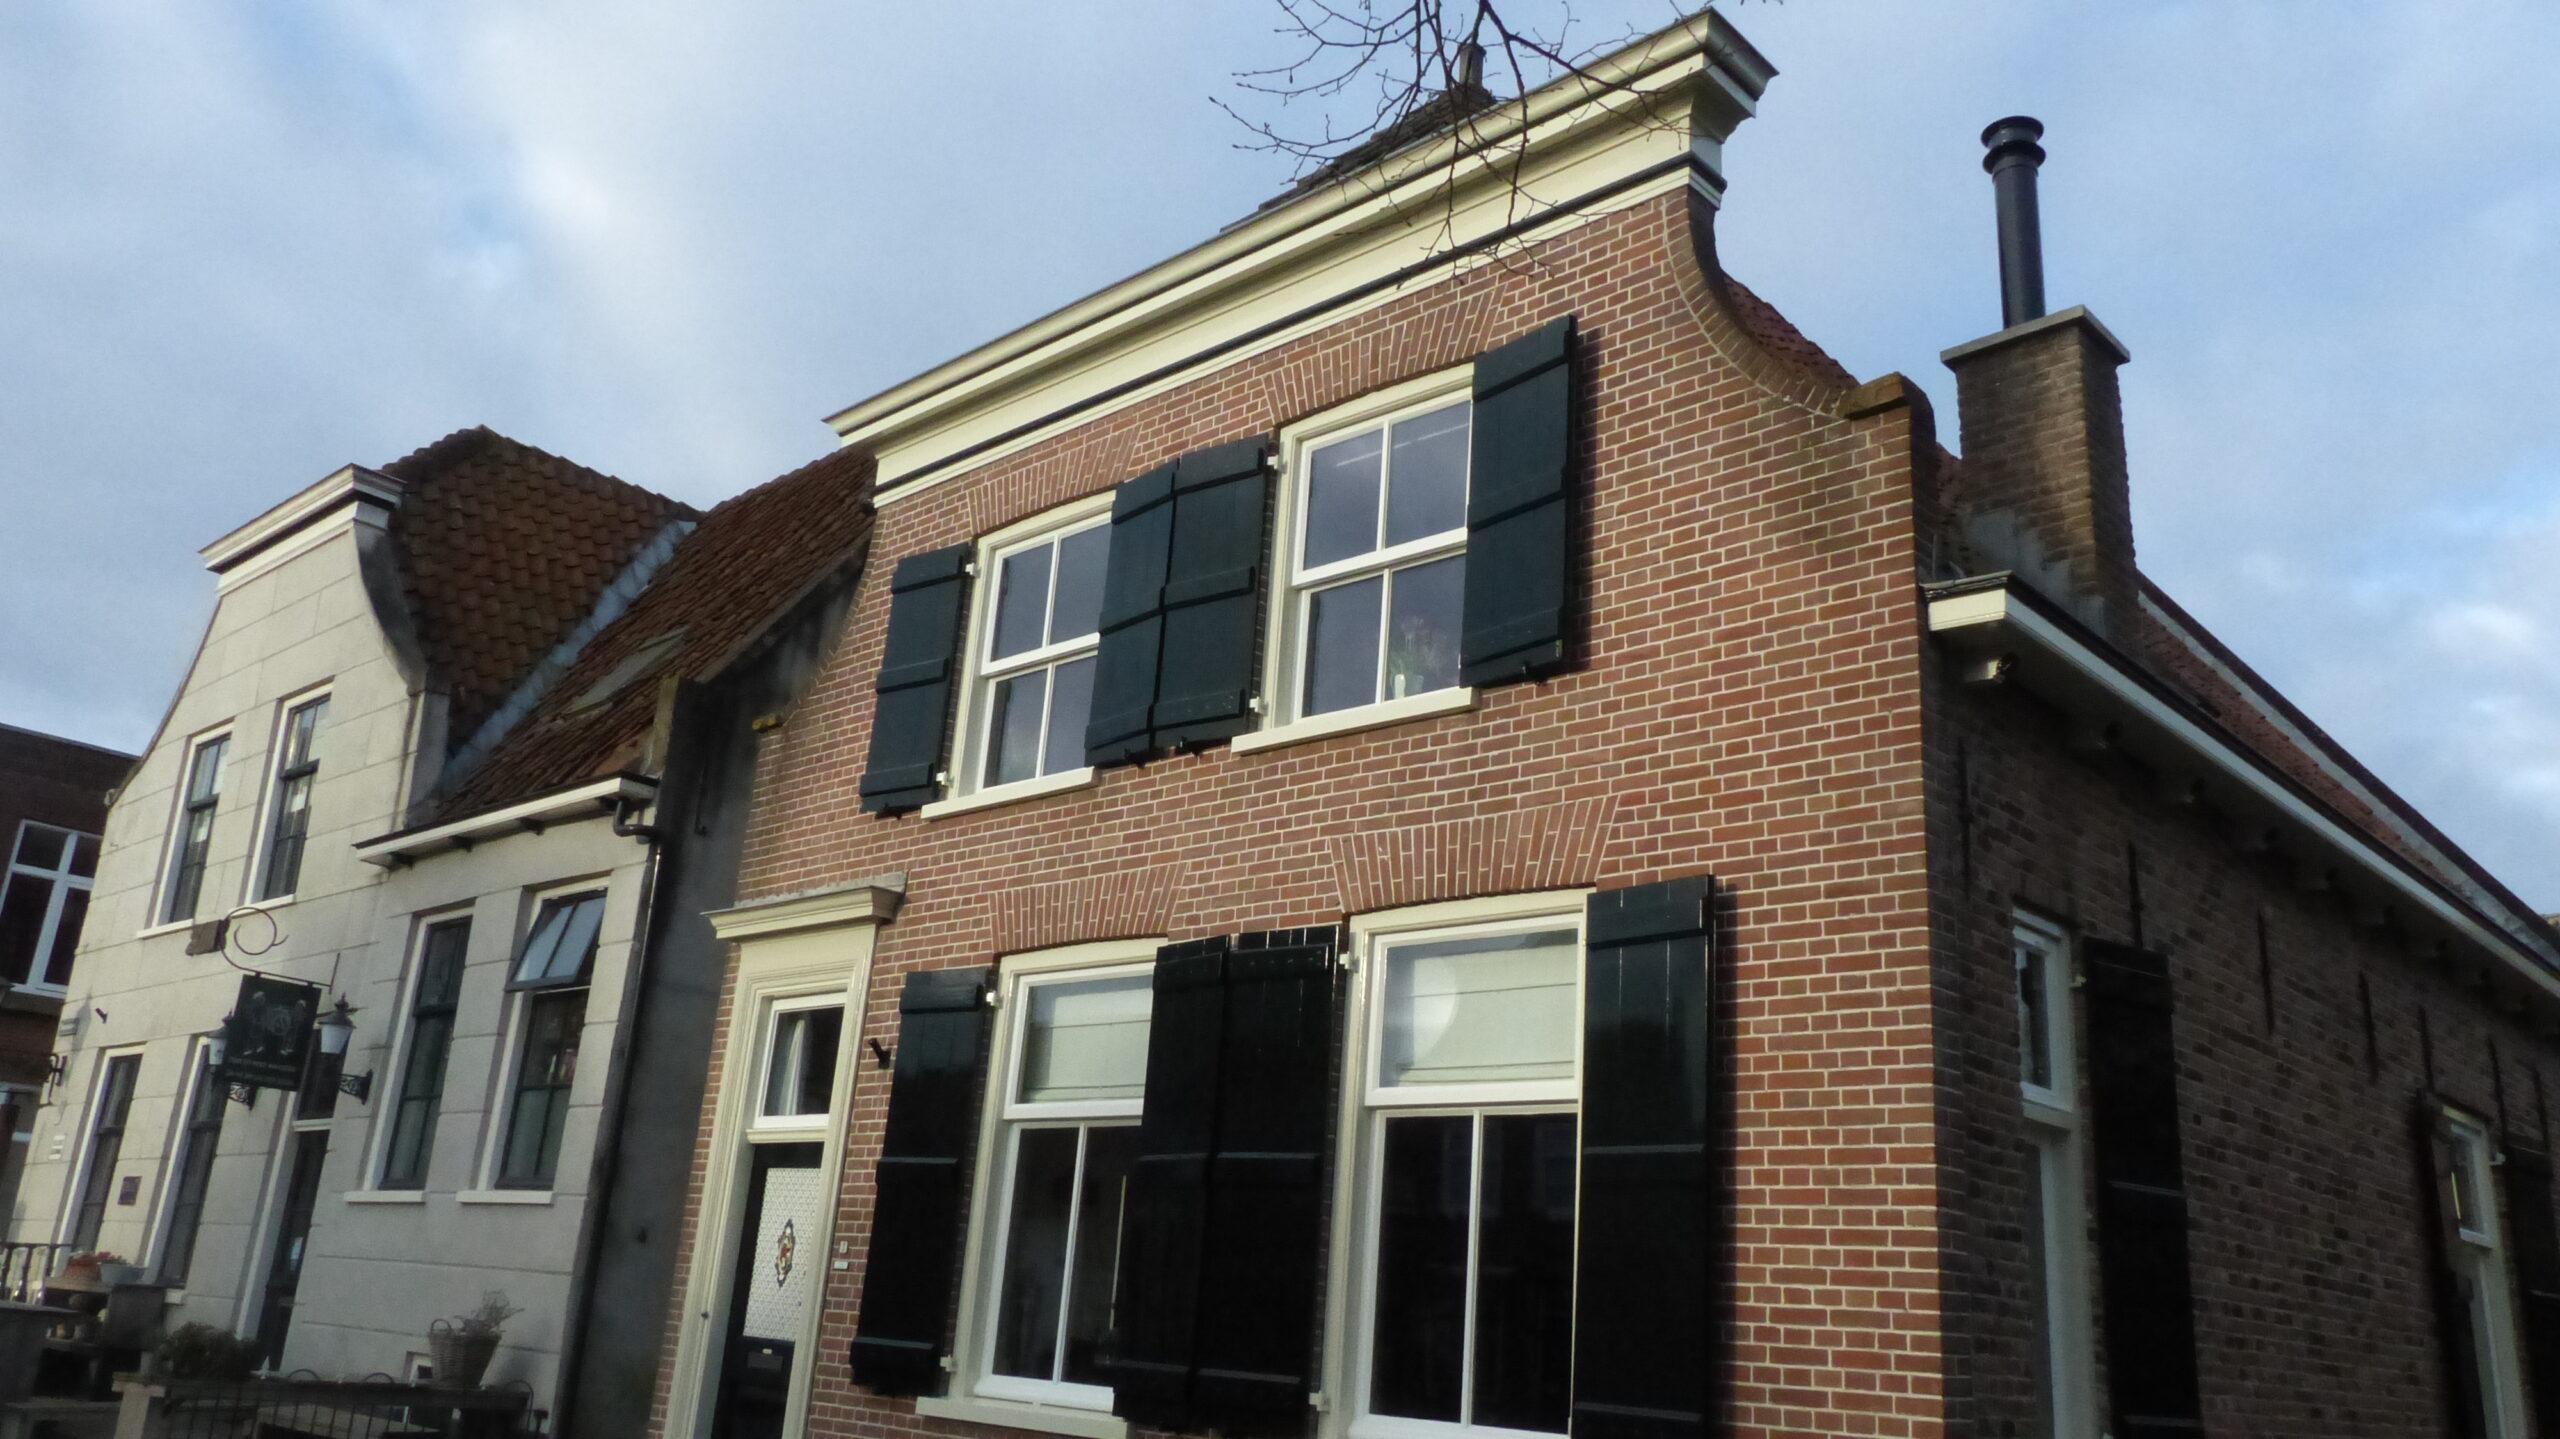 Voorgevel Nieuwpoorts monument woonhuis